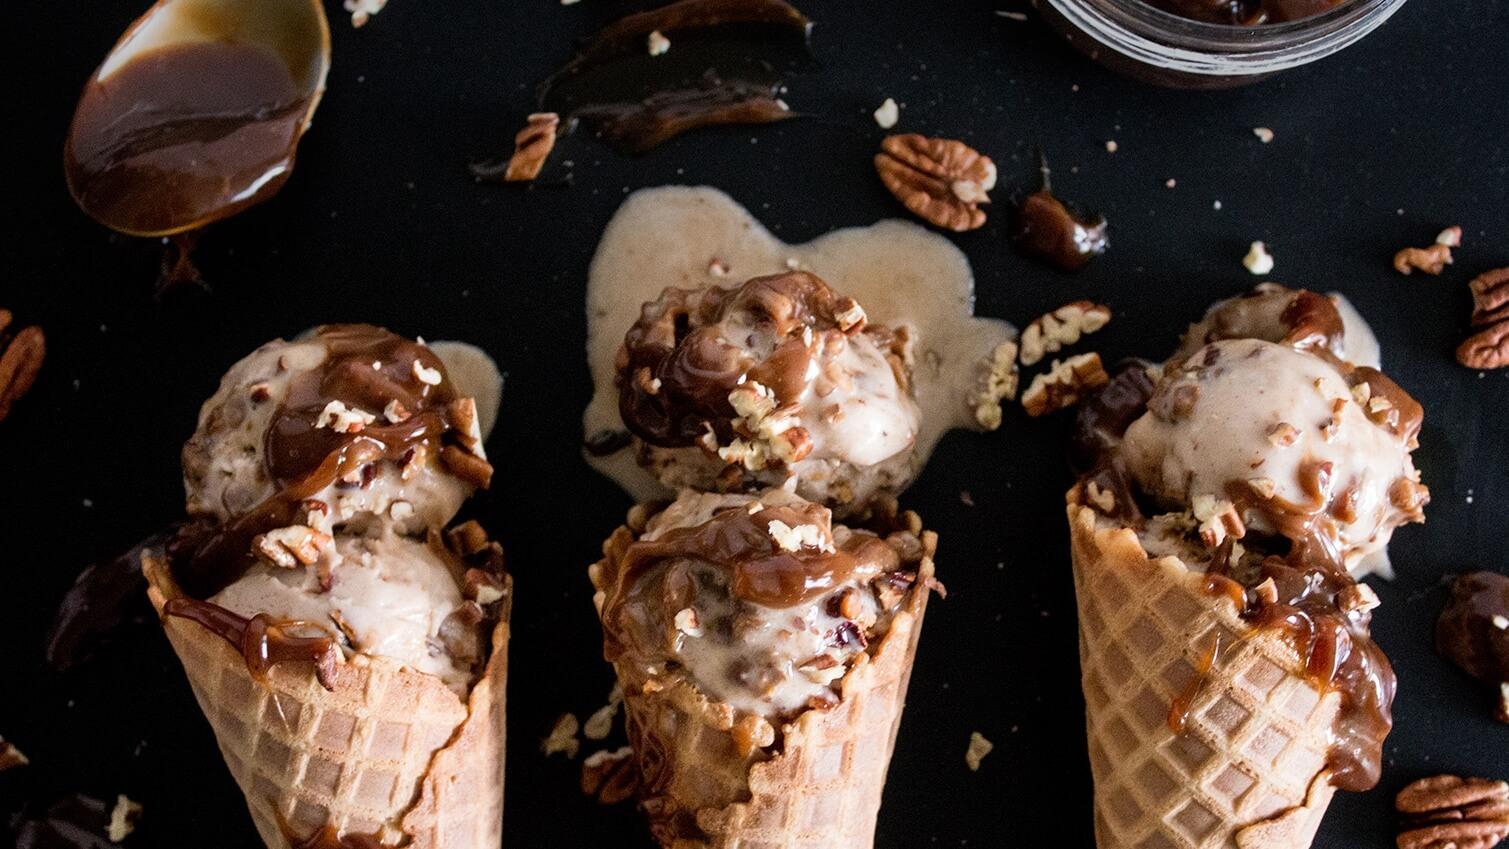 Salt & Straw Ice Cream Chain Launches Vegan Bacon Flavored Scoop to Menu